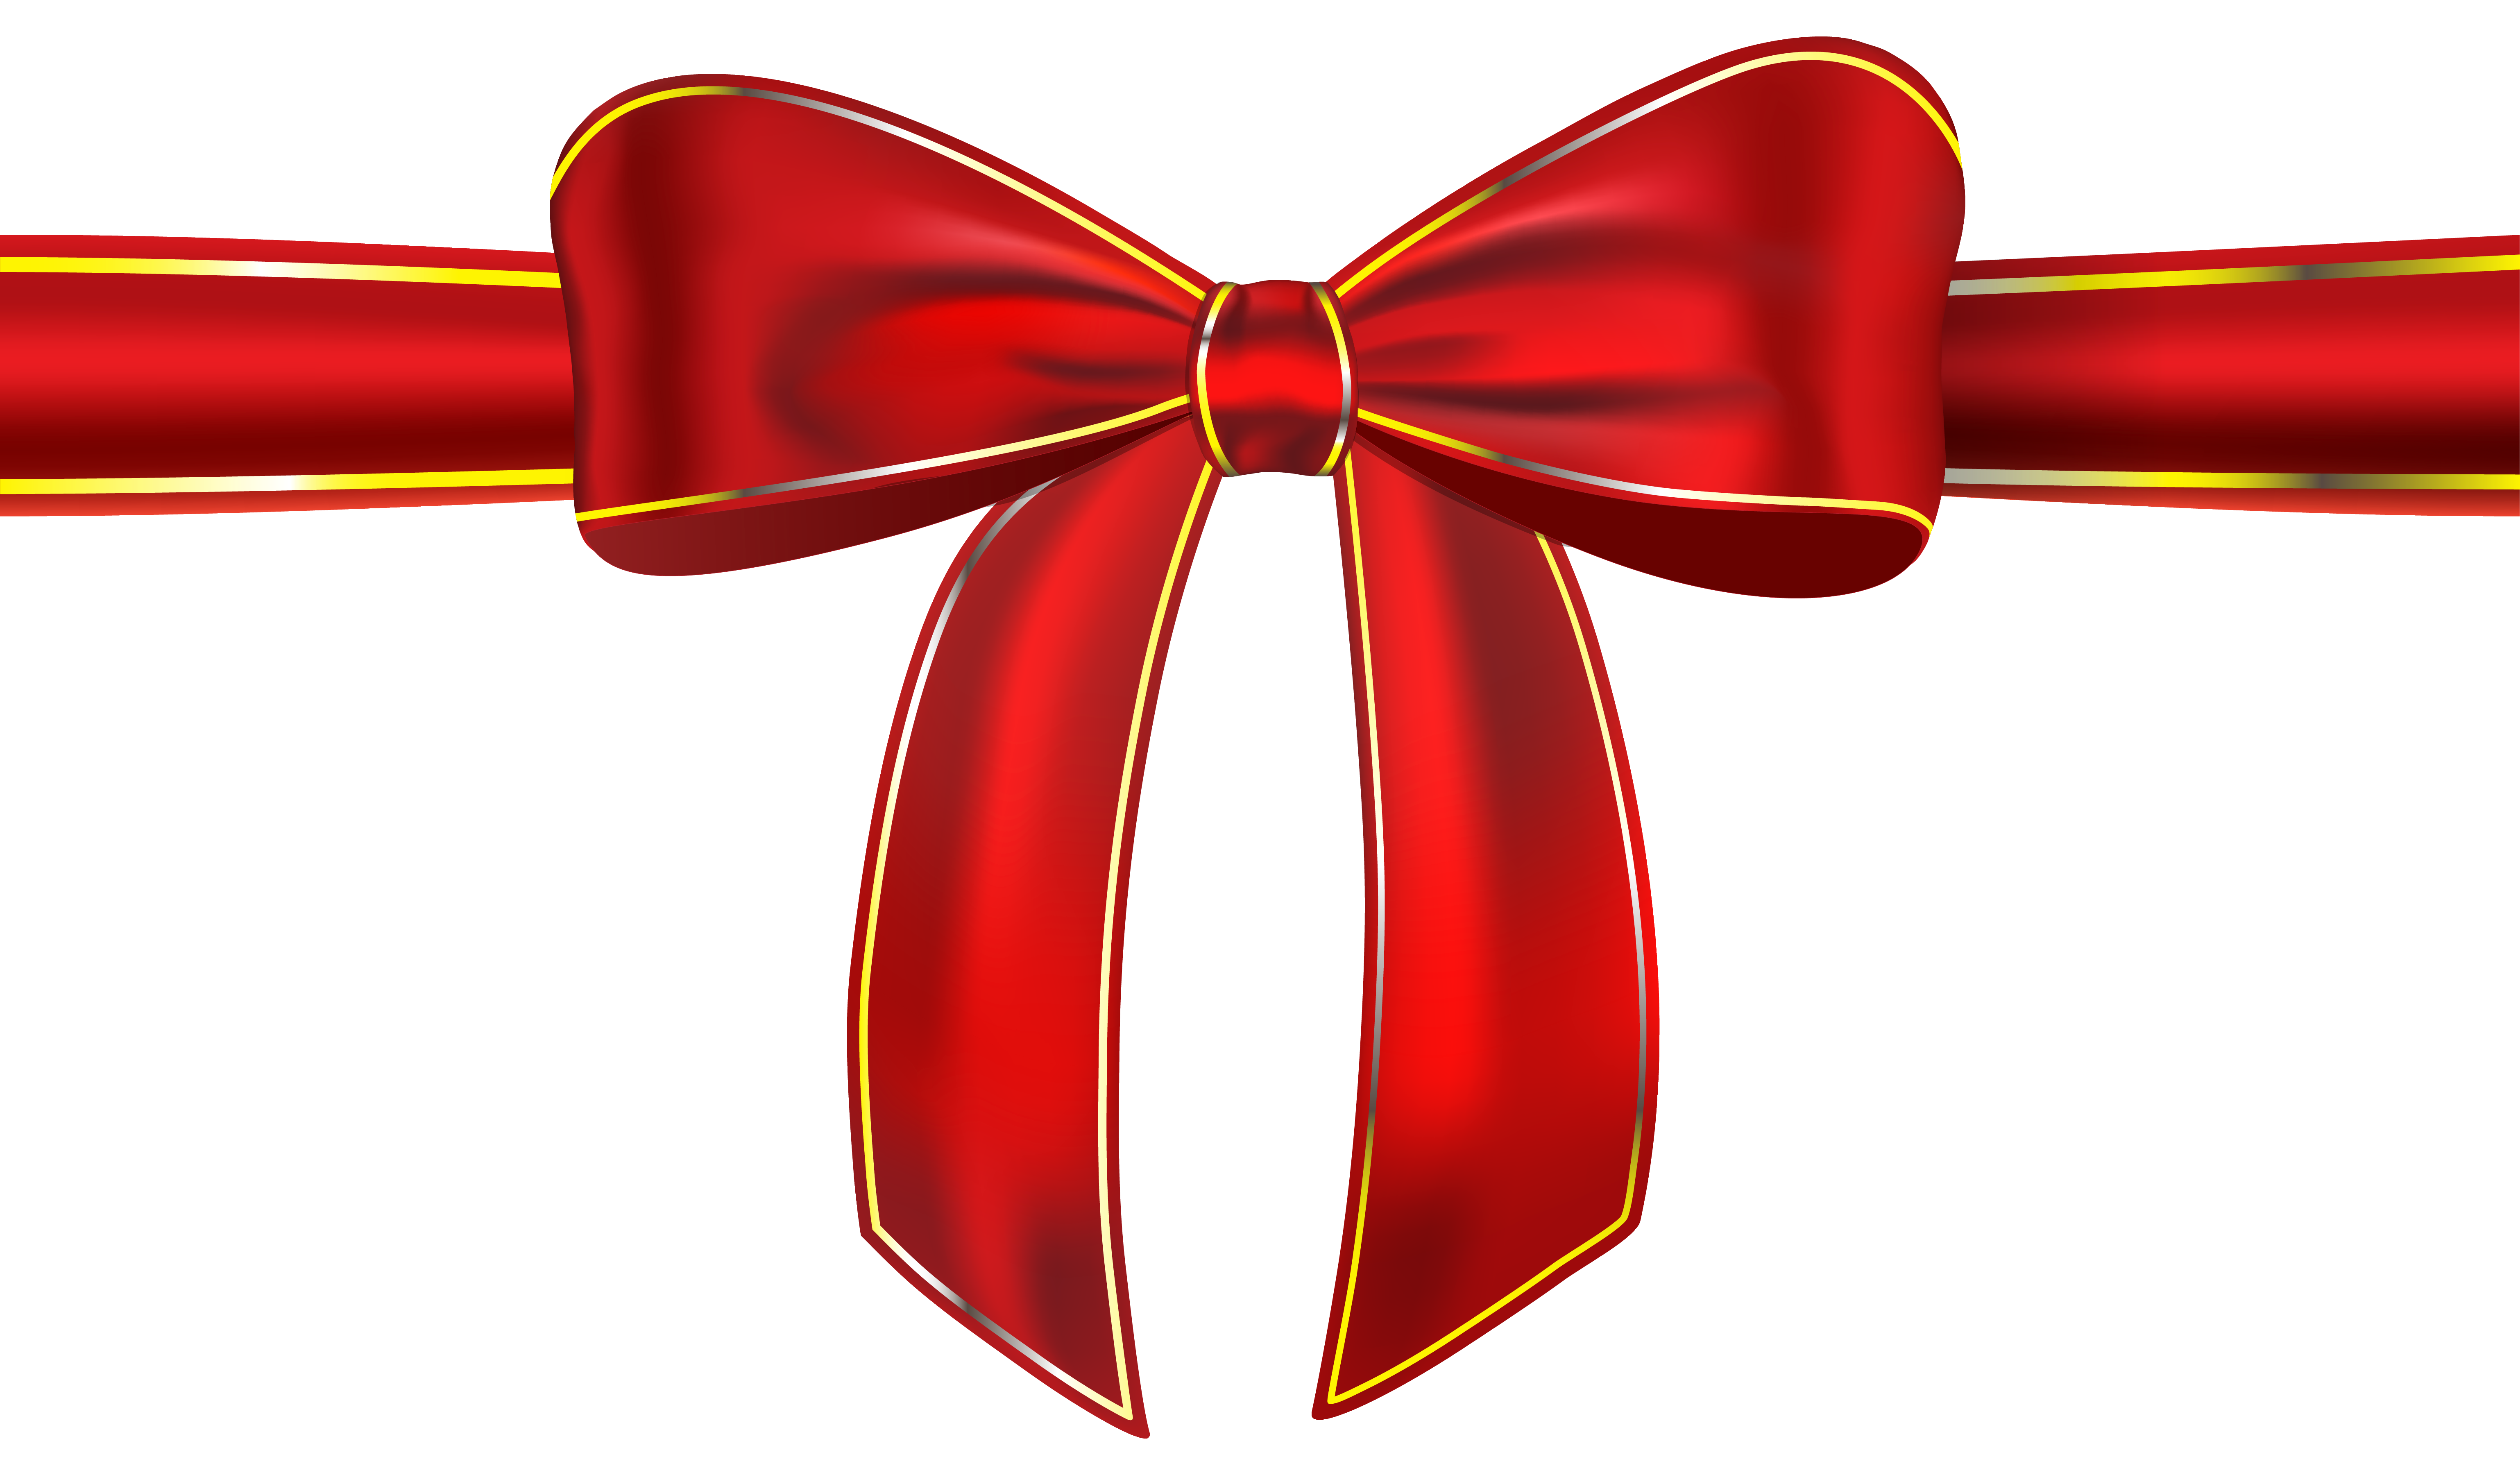 Red Ribbon Bow Clip Art